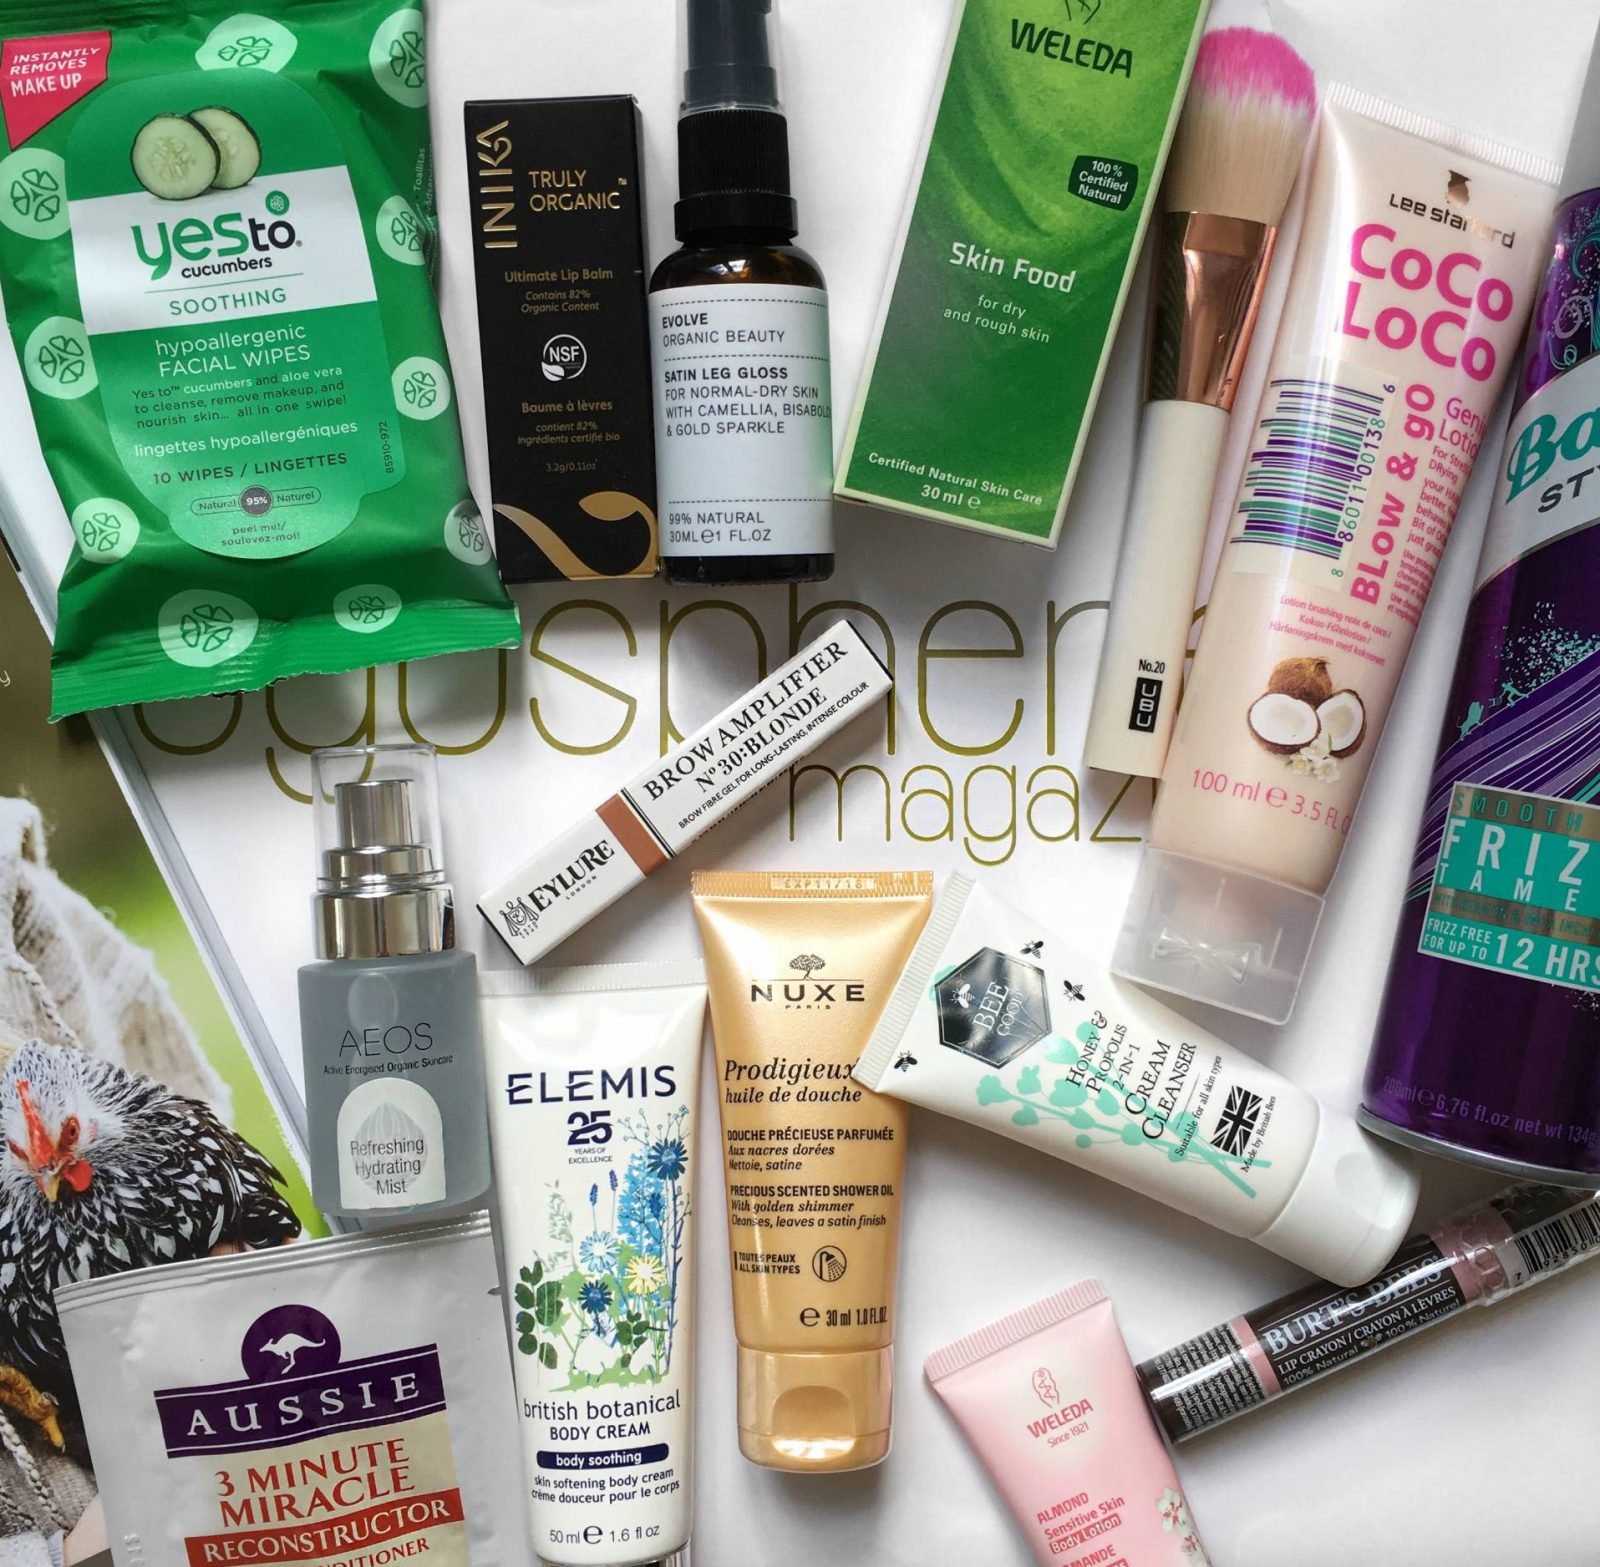 Blogosphere Magazine Event - Goodie Bag Reveal